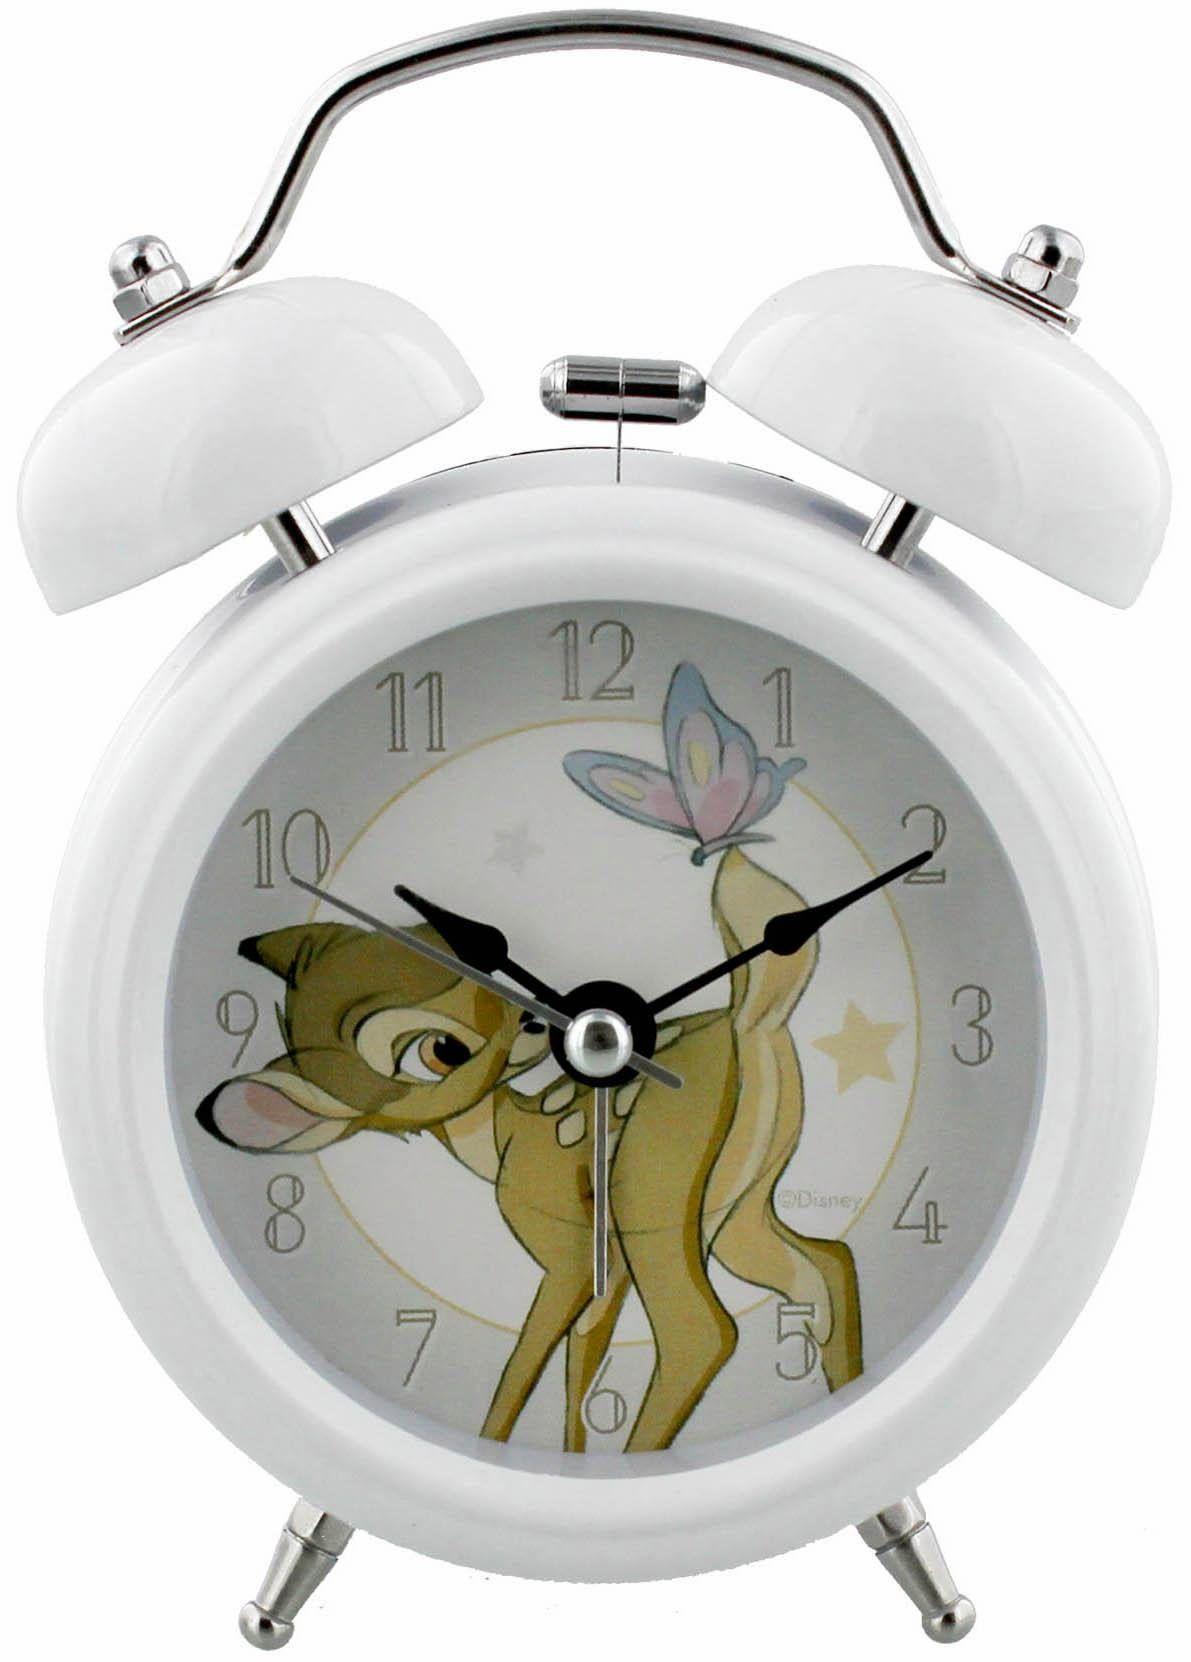 Home affaire Wecker weiß, »Disney Bambi« Jetzt bestellen unter: https://moebel.ladendirekt.de/dekoration/uhren/wecker/?uid=d413a77d-f845-5464-8552-473ef61ee60b&utm_source=pinterest&utm_medium=pin&utm_campaign=boards #uhren #wecker #dekoration